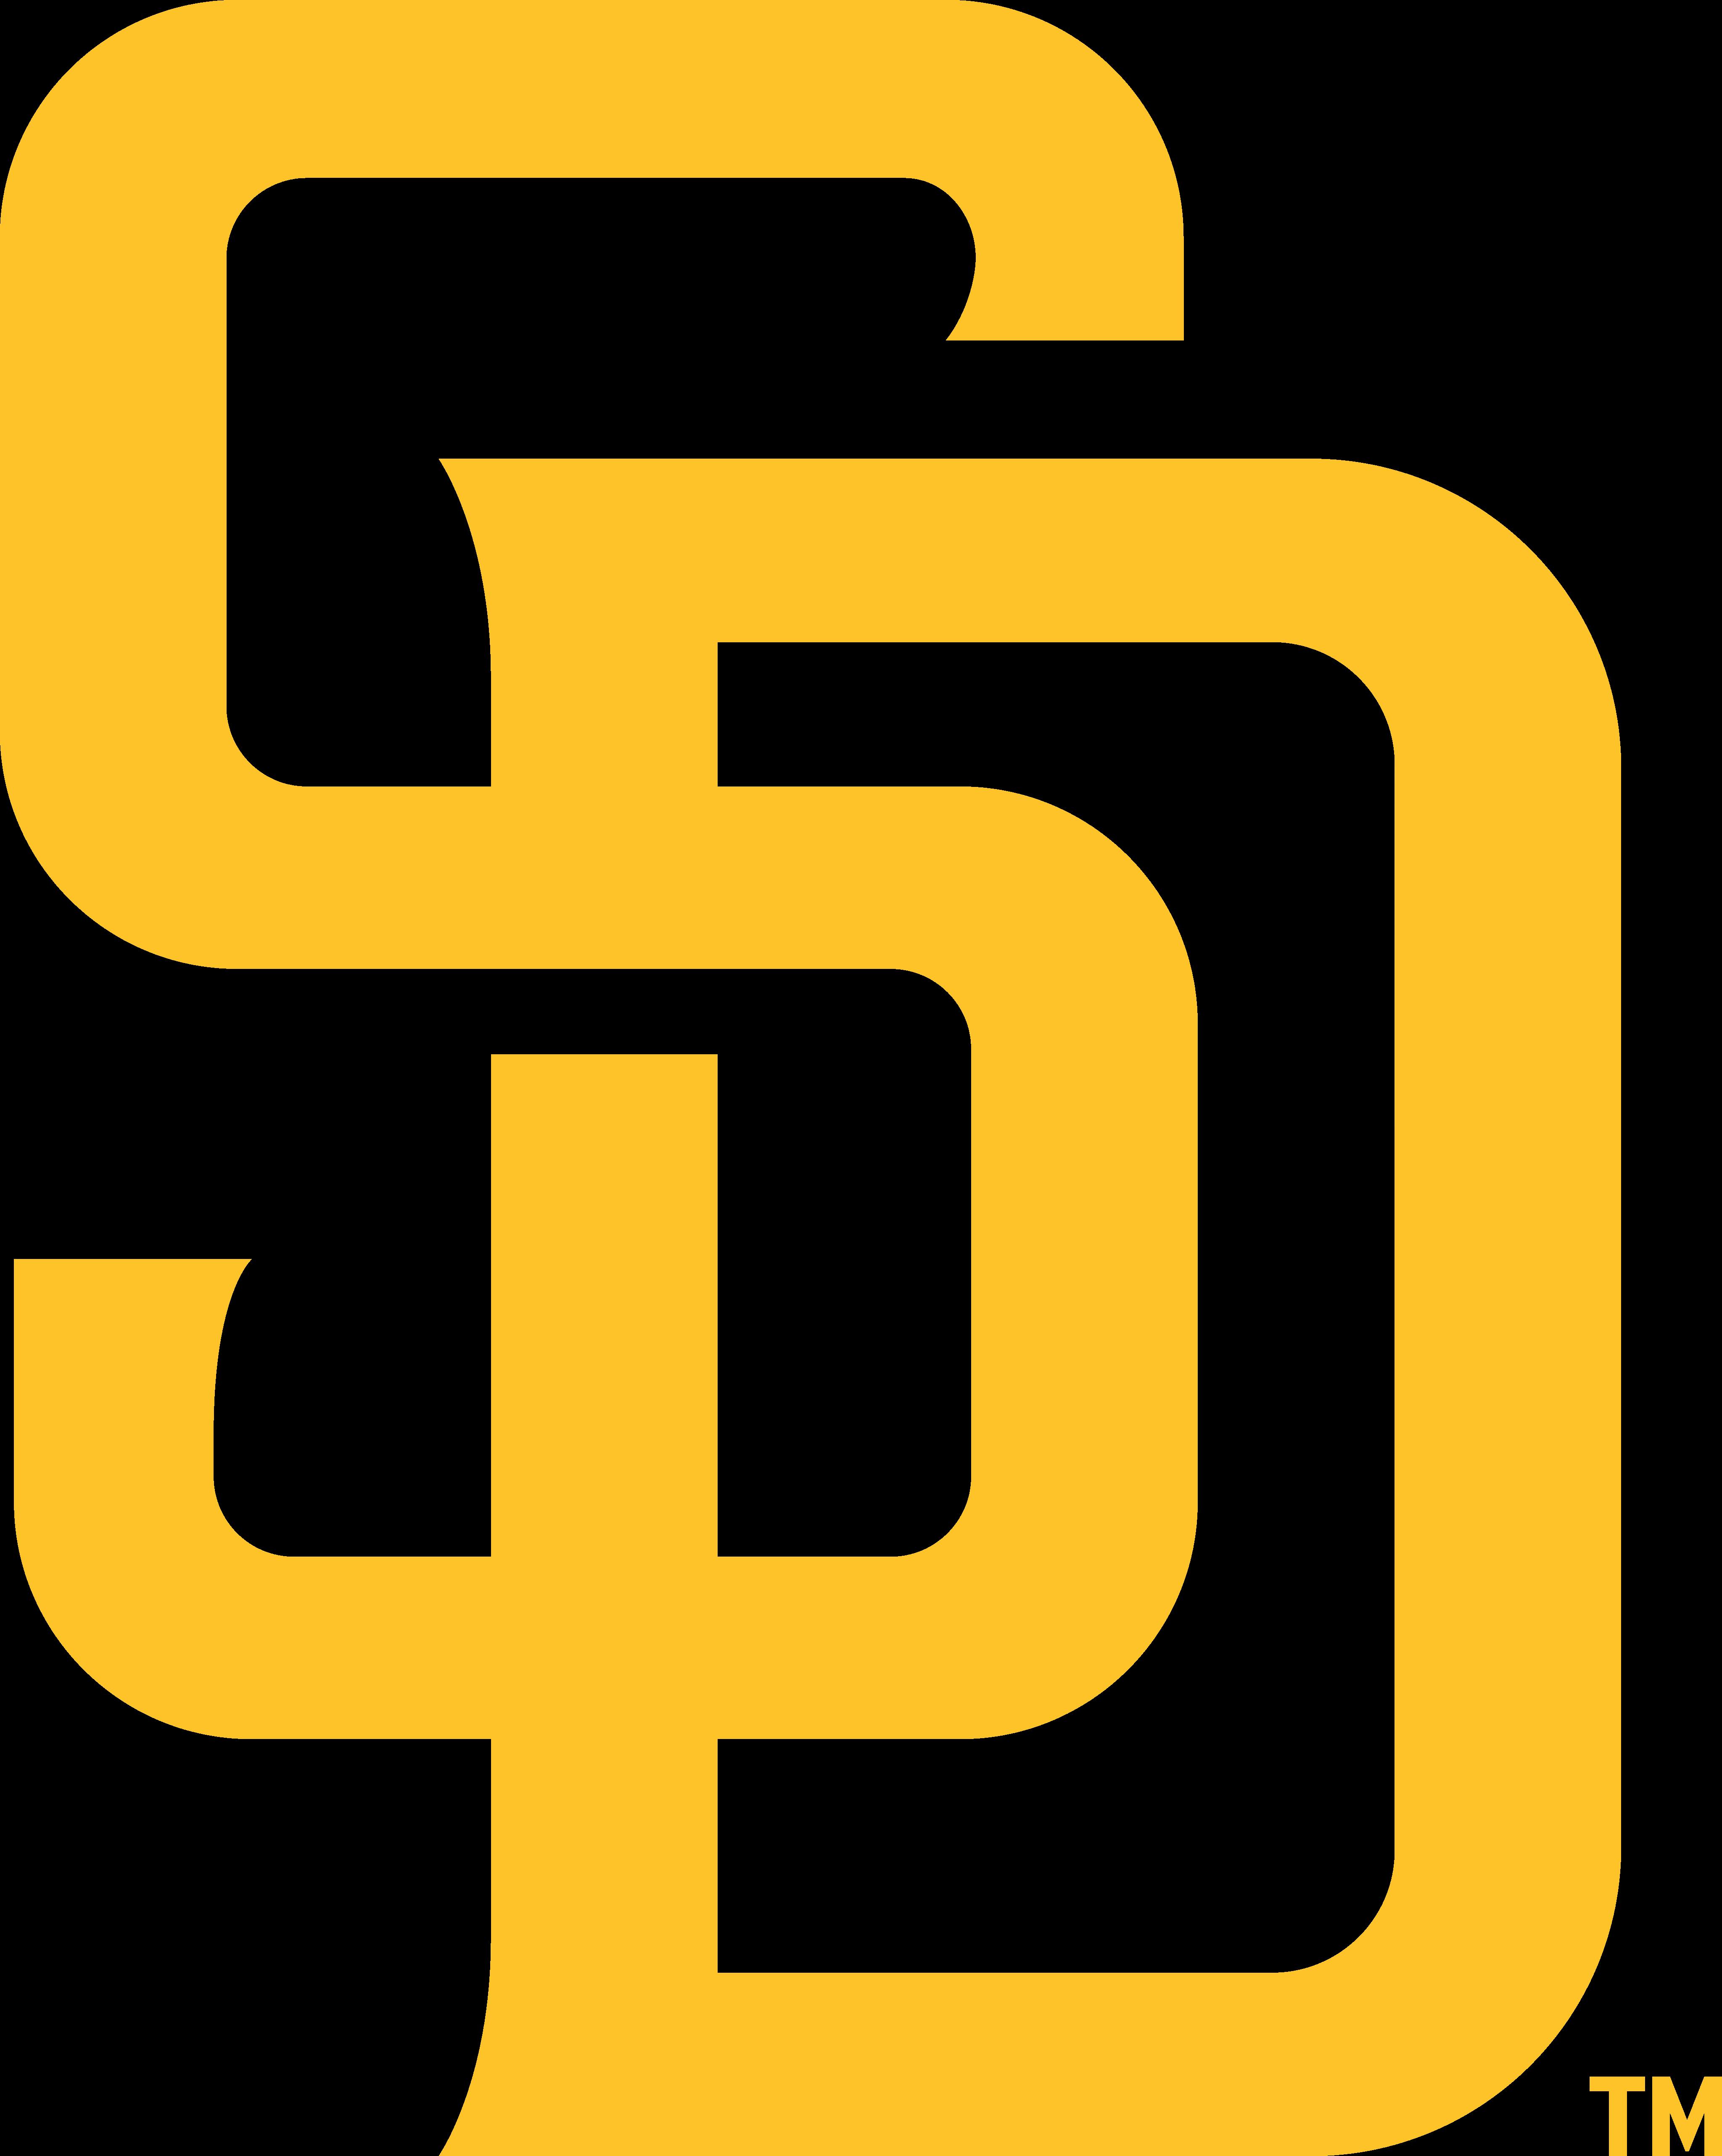 san diego padres logo 1 - San Diego Padres Logo